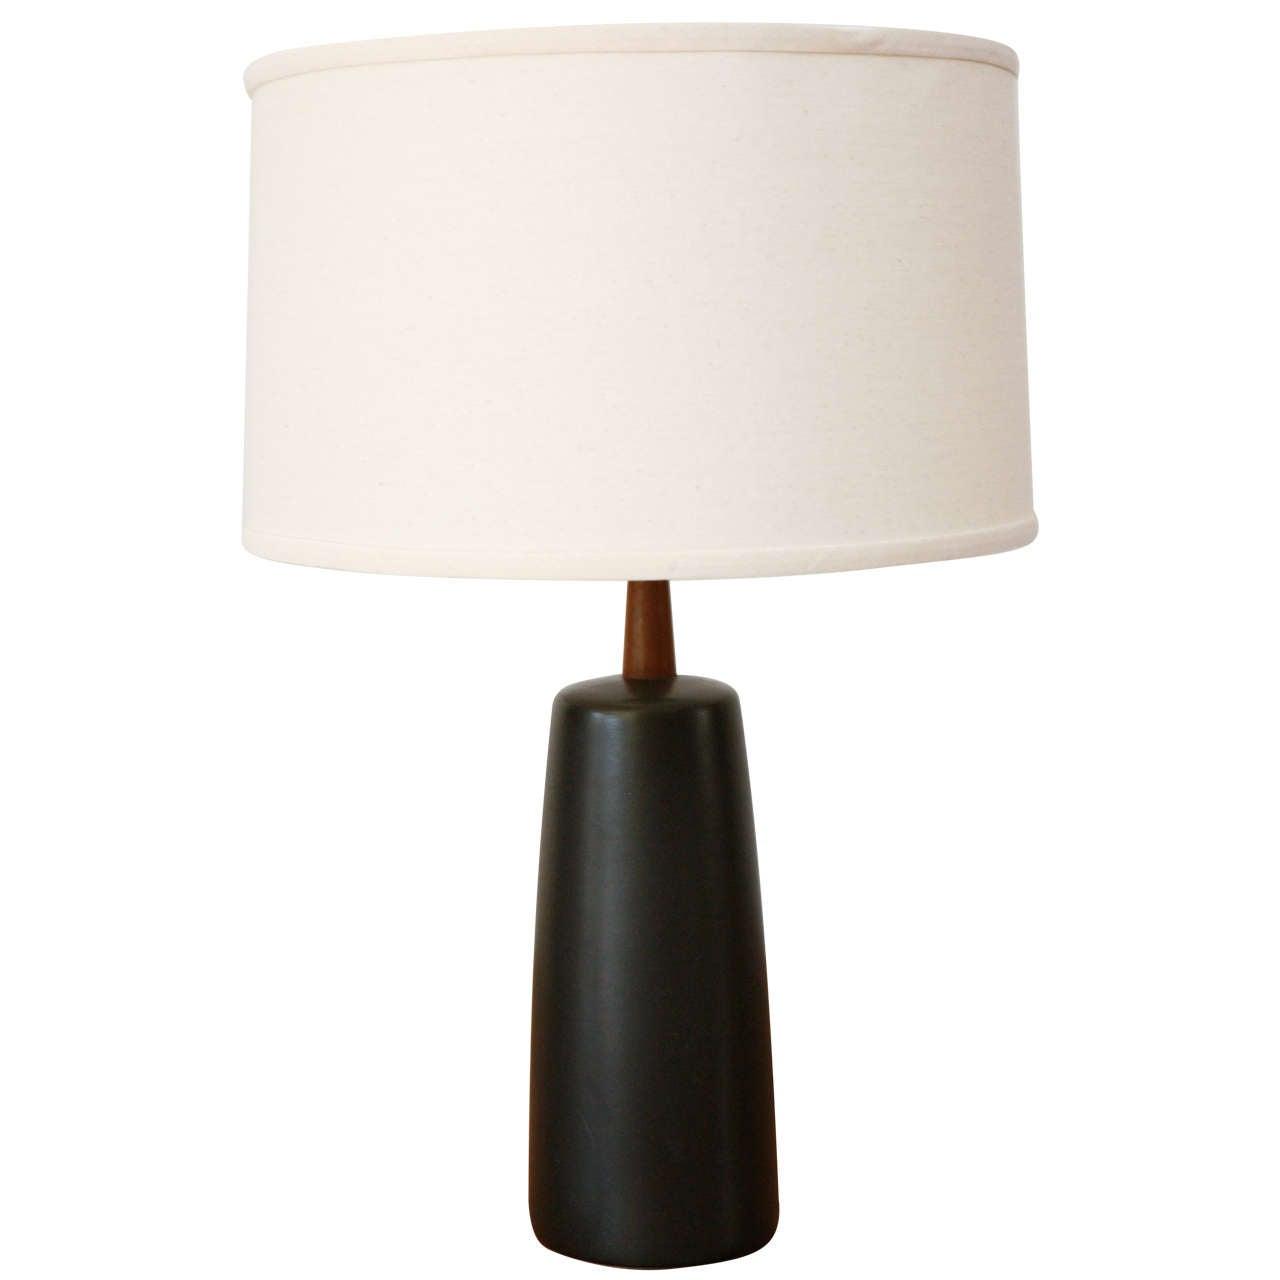 Matte Black Ceramic Martz Lamp by Marshall Studios at 1stdibs